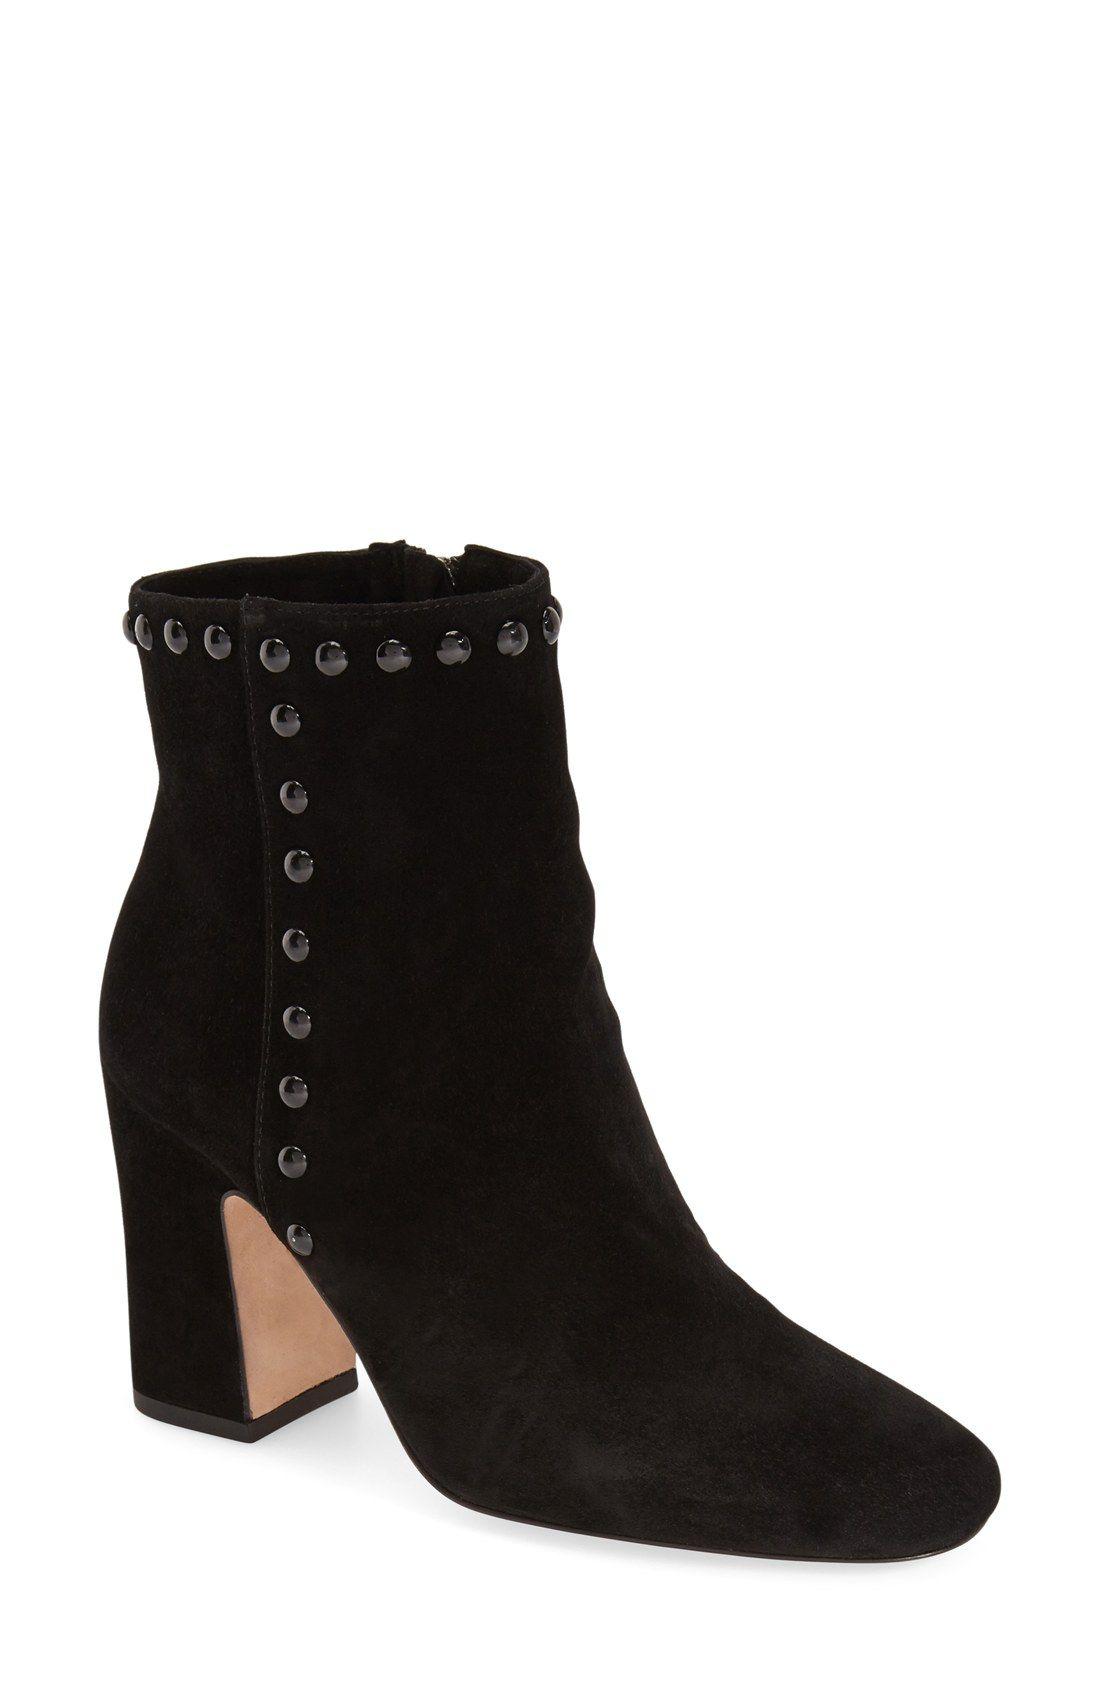 Womens Boots COACH Felicia Black Suede